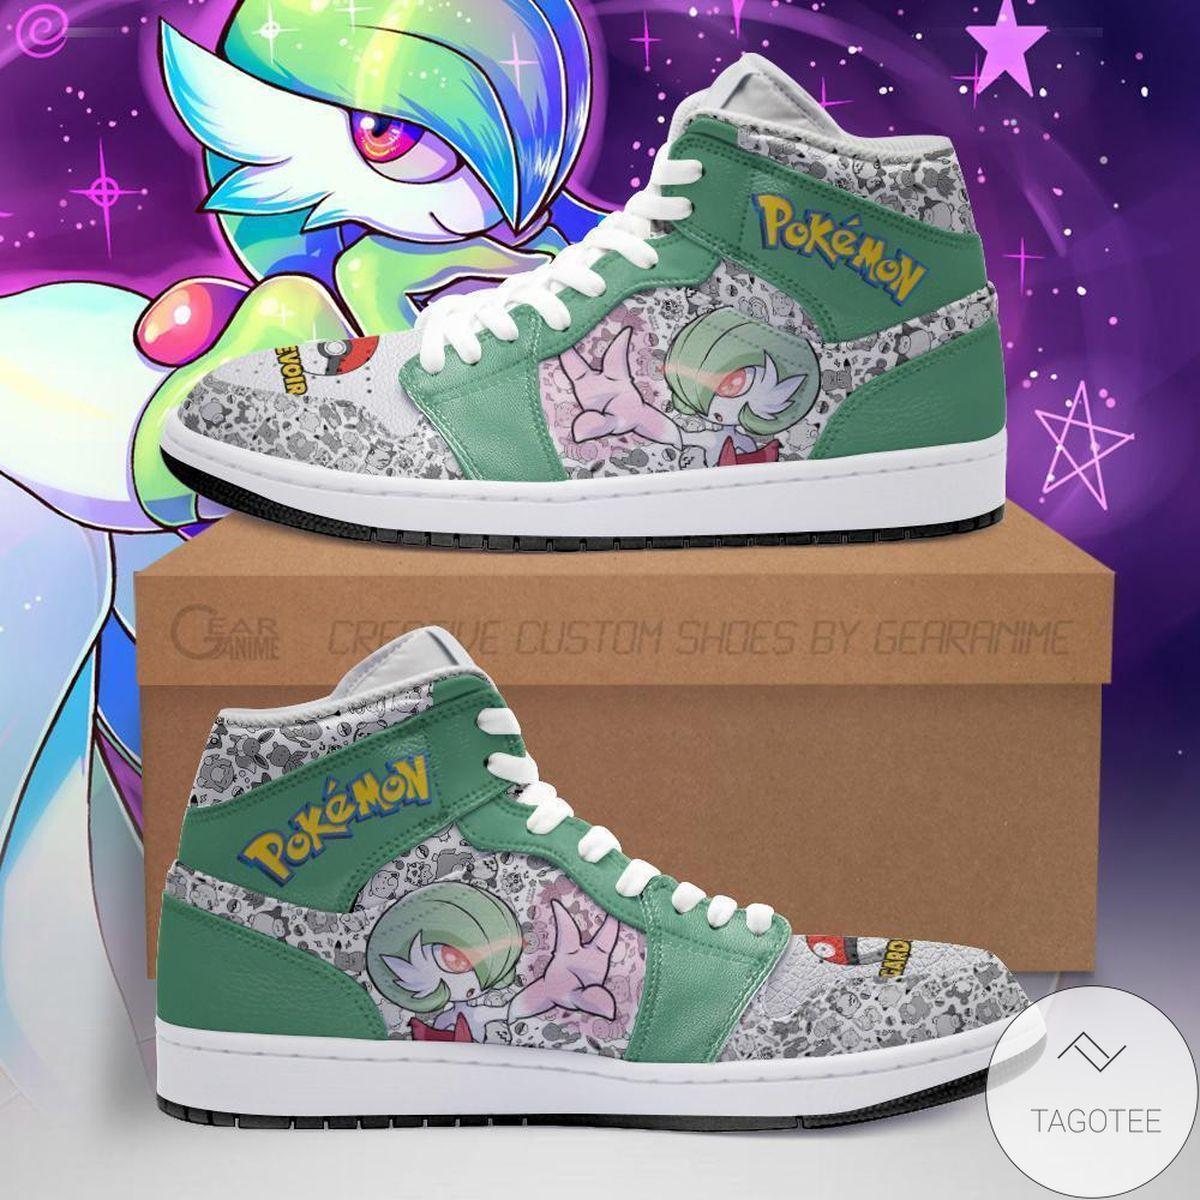 Gardevoir Pokemon Air Jordan High Top Shoes